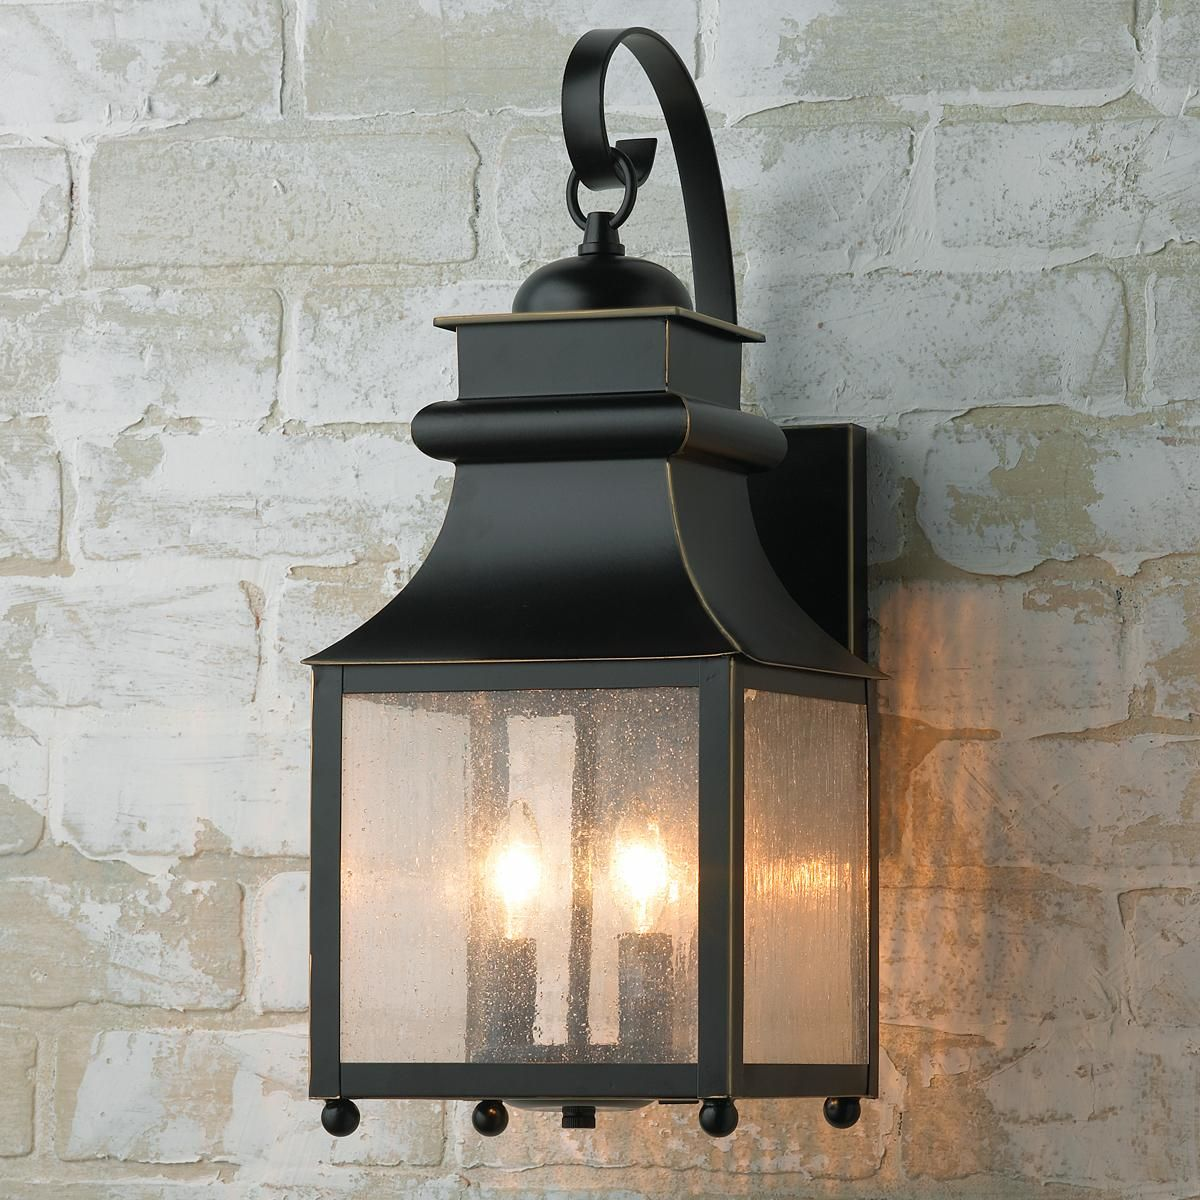 Homesteader seeded glass outdoor wall lantern outdoor wall lantern